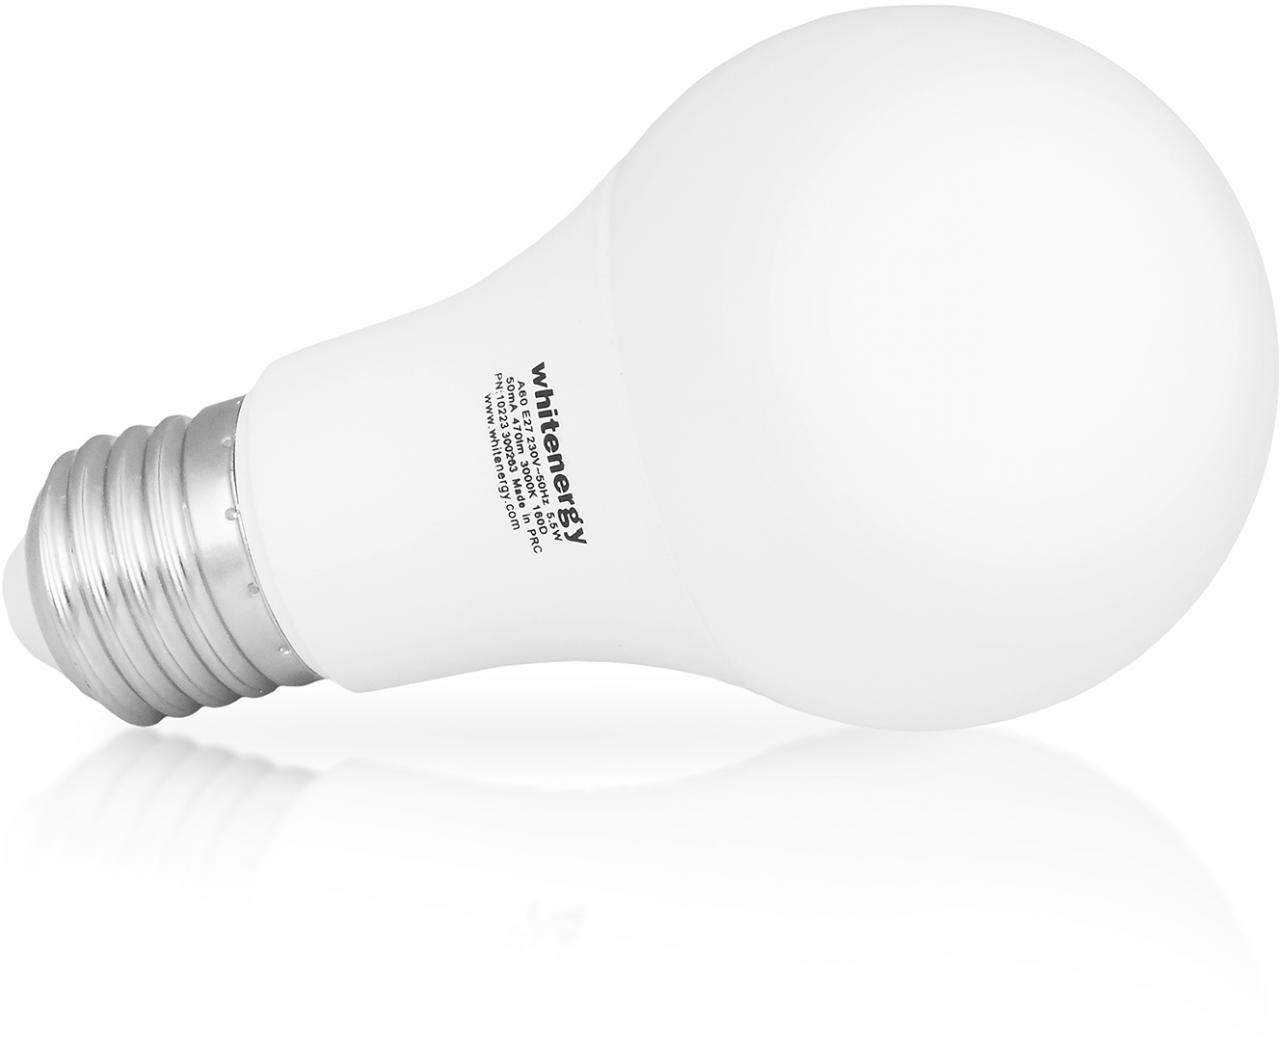 Fotografie Whitenergy LED žárovka | E27 | 15 SMD2835 | 12W | 230V tepla bílá | A60